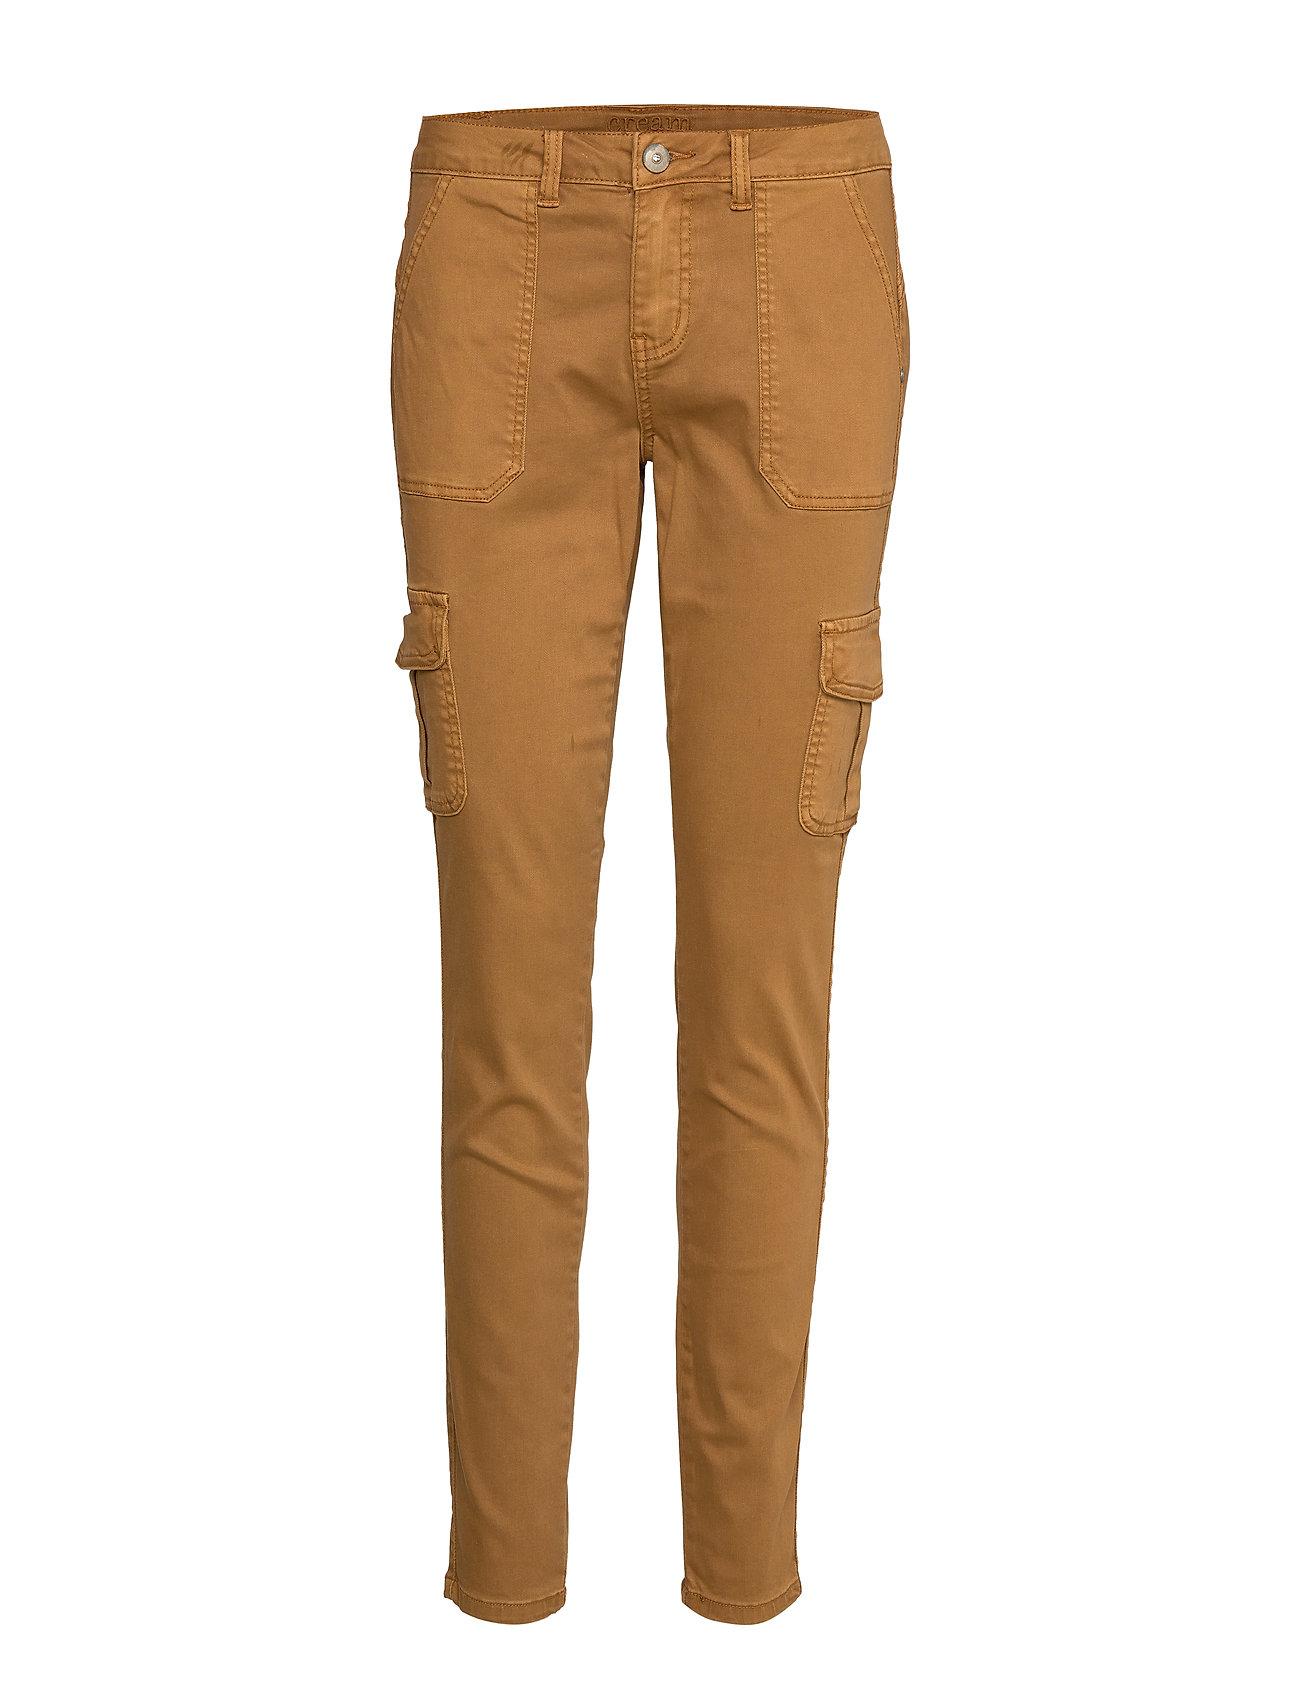 Cream Annie Cargo Pants - Baiily - BRONZED